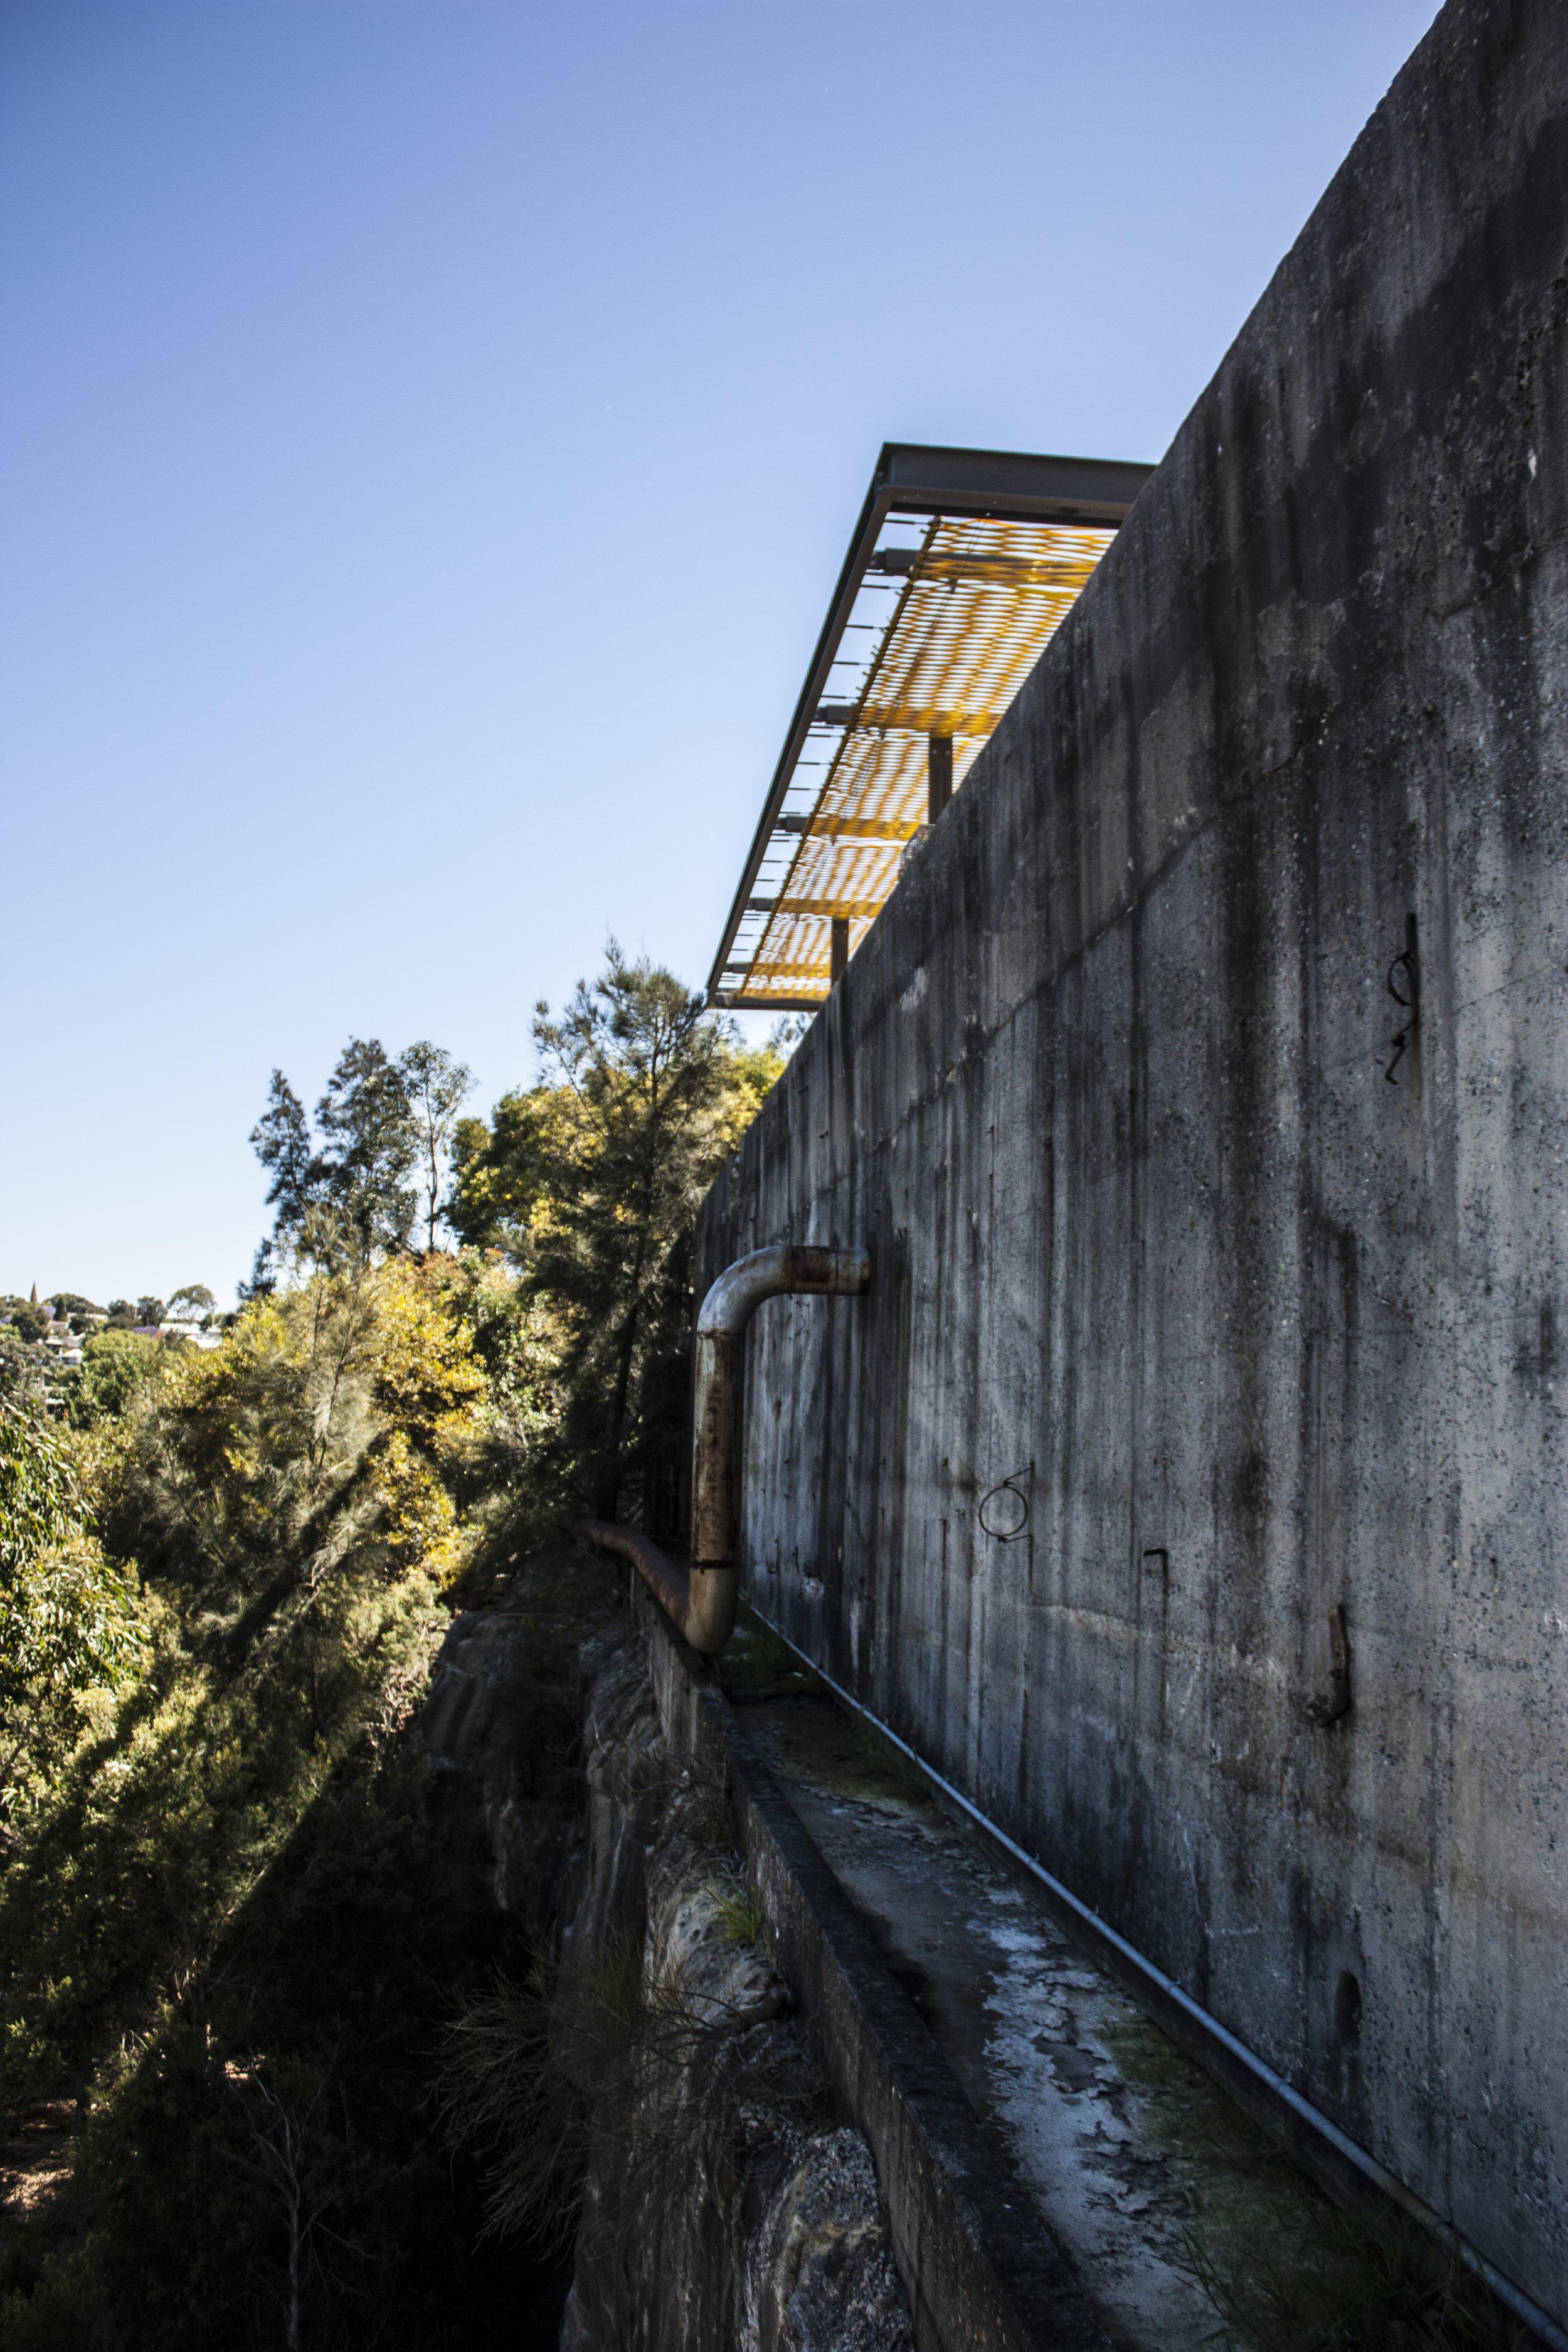 Australia_Sydney_Ballast Point Park_Concrete Wall.jpg